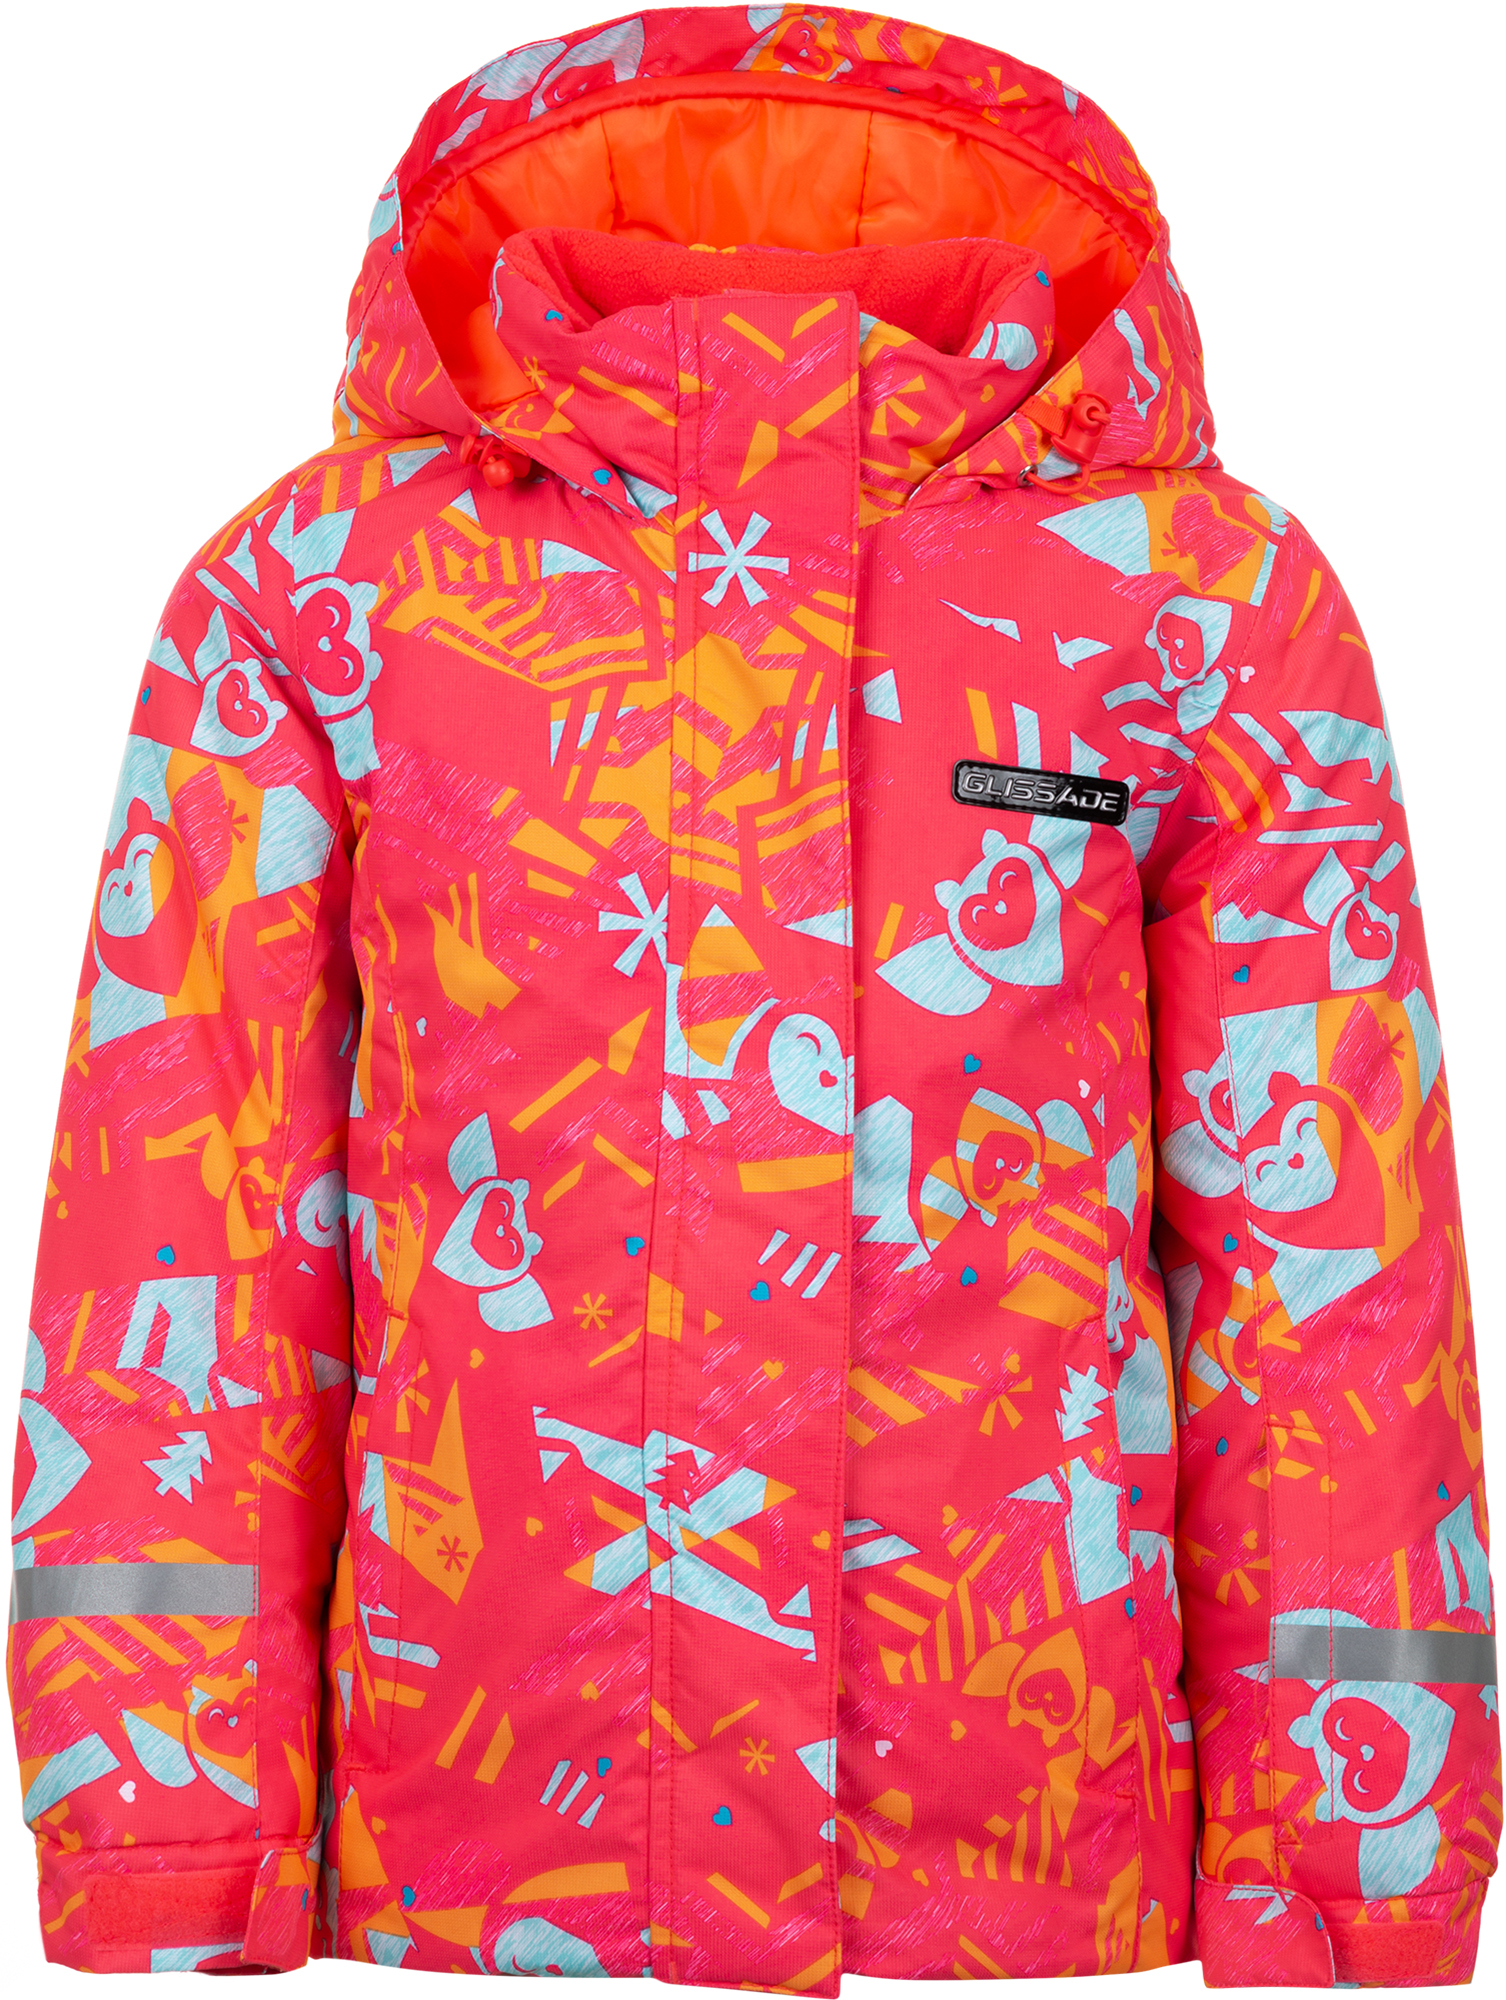 Glissade Куртка утепленная для девочек Glissade, размер 122